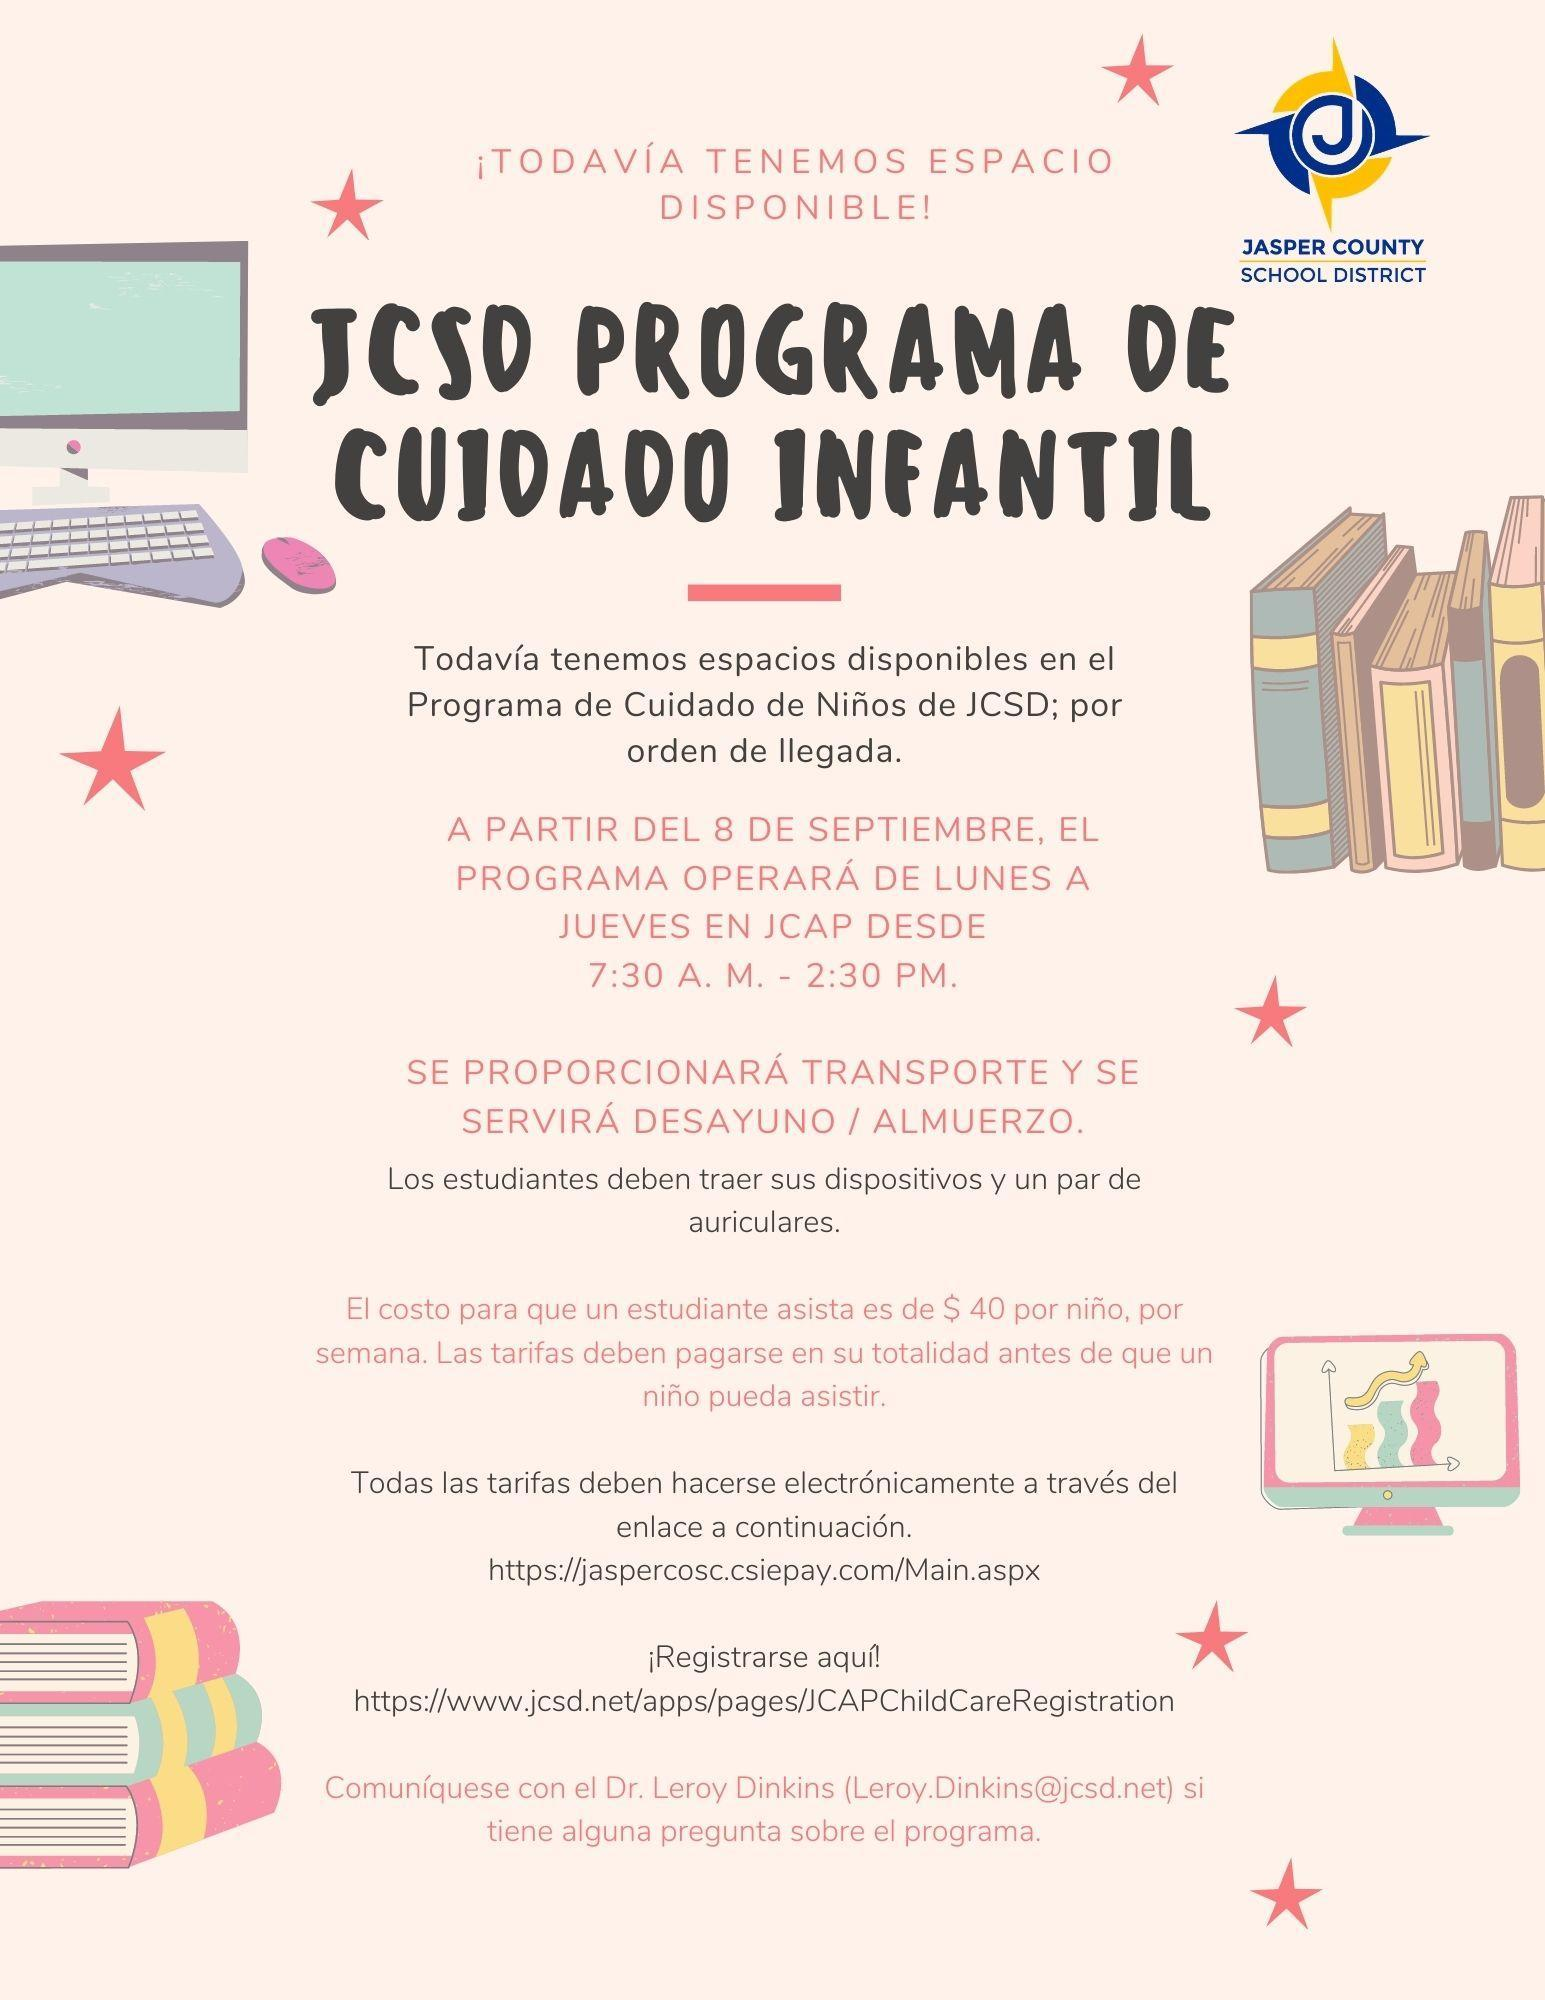 JCSD Programa De Cuidado infantil